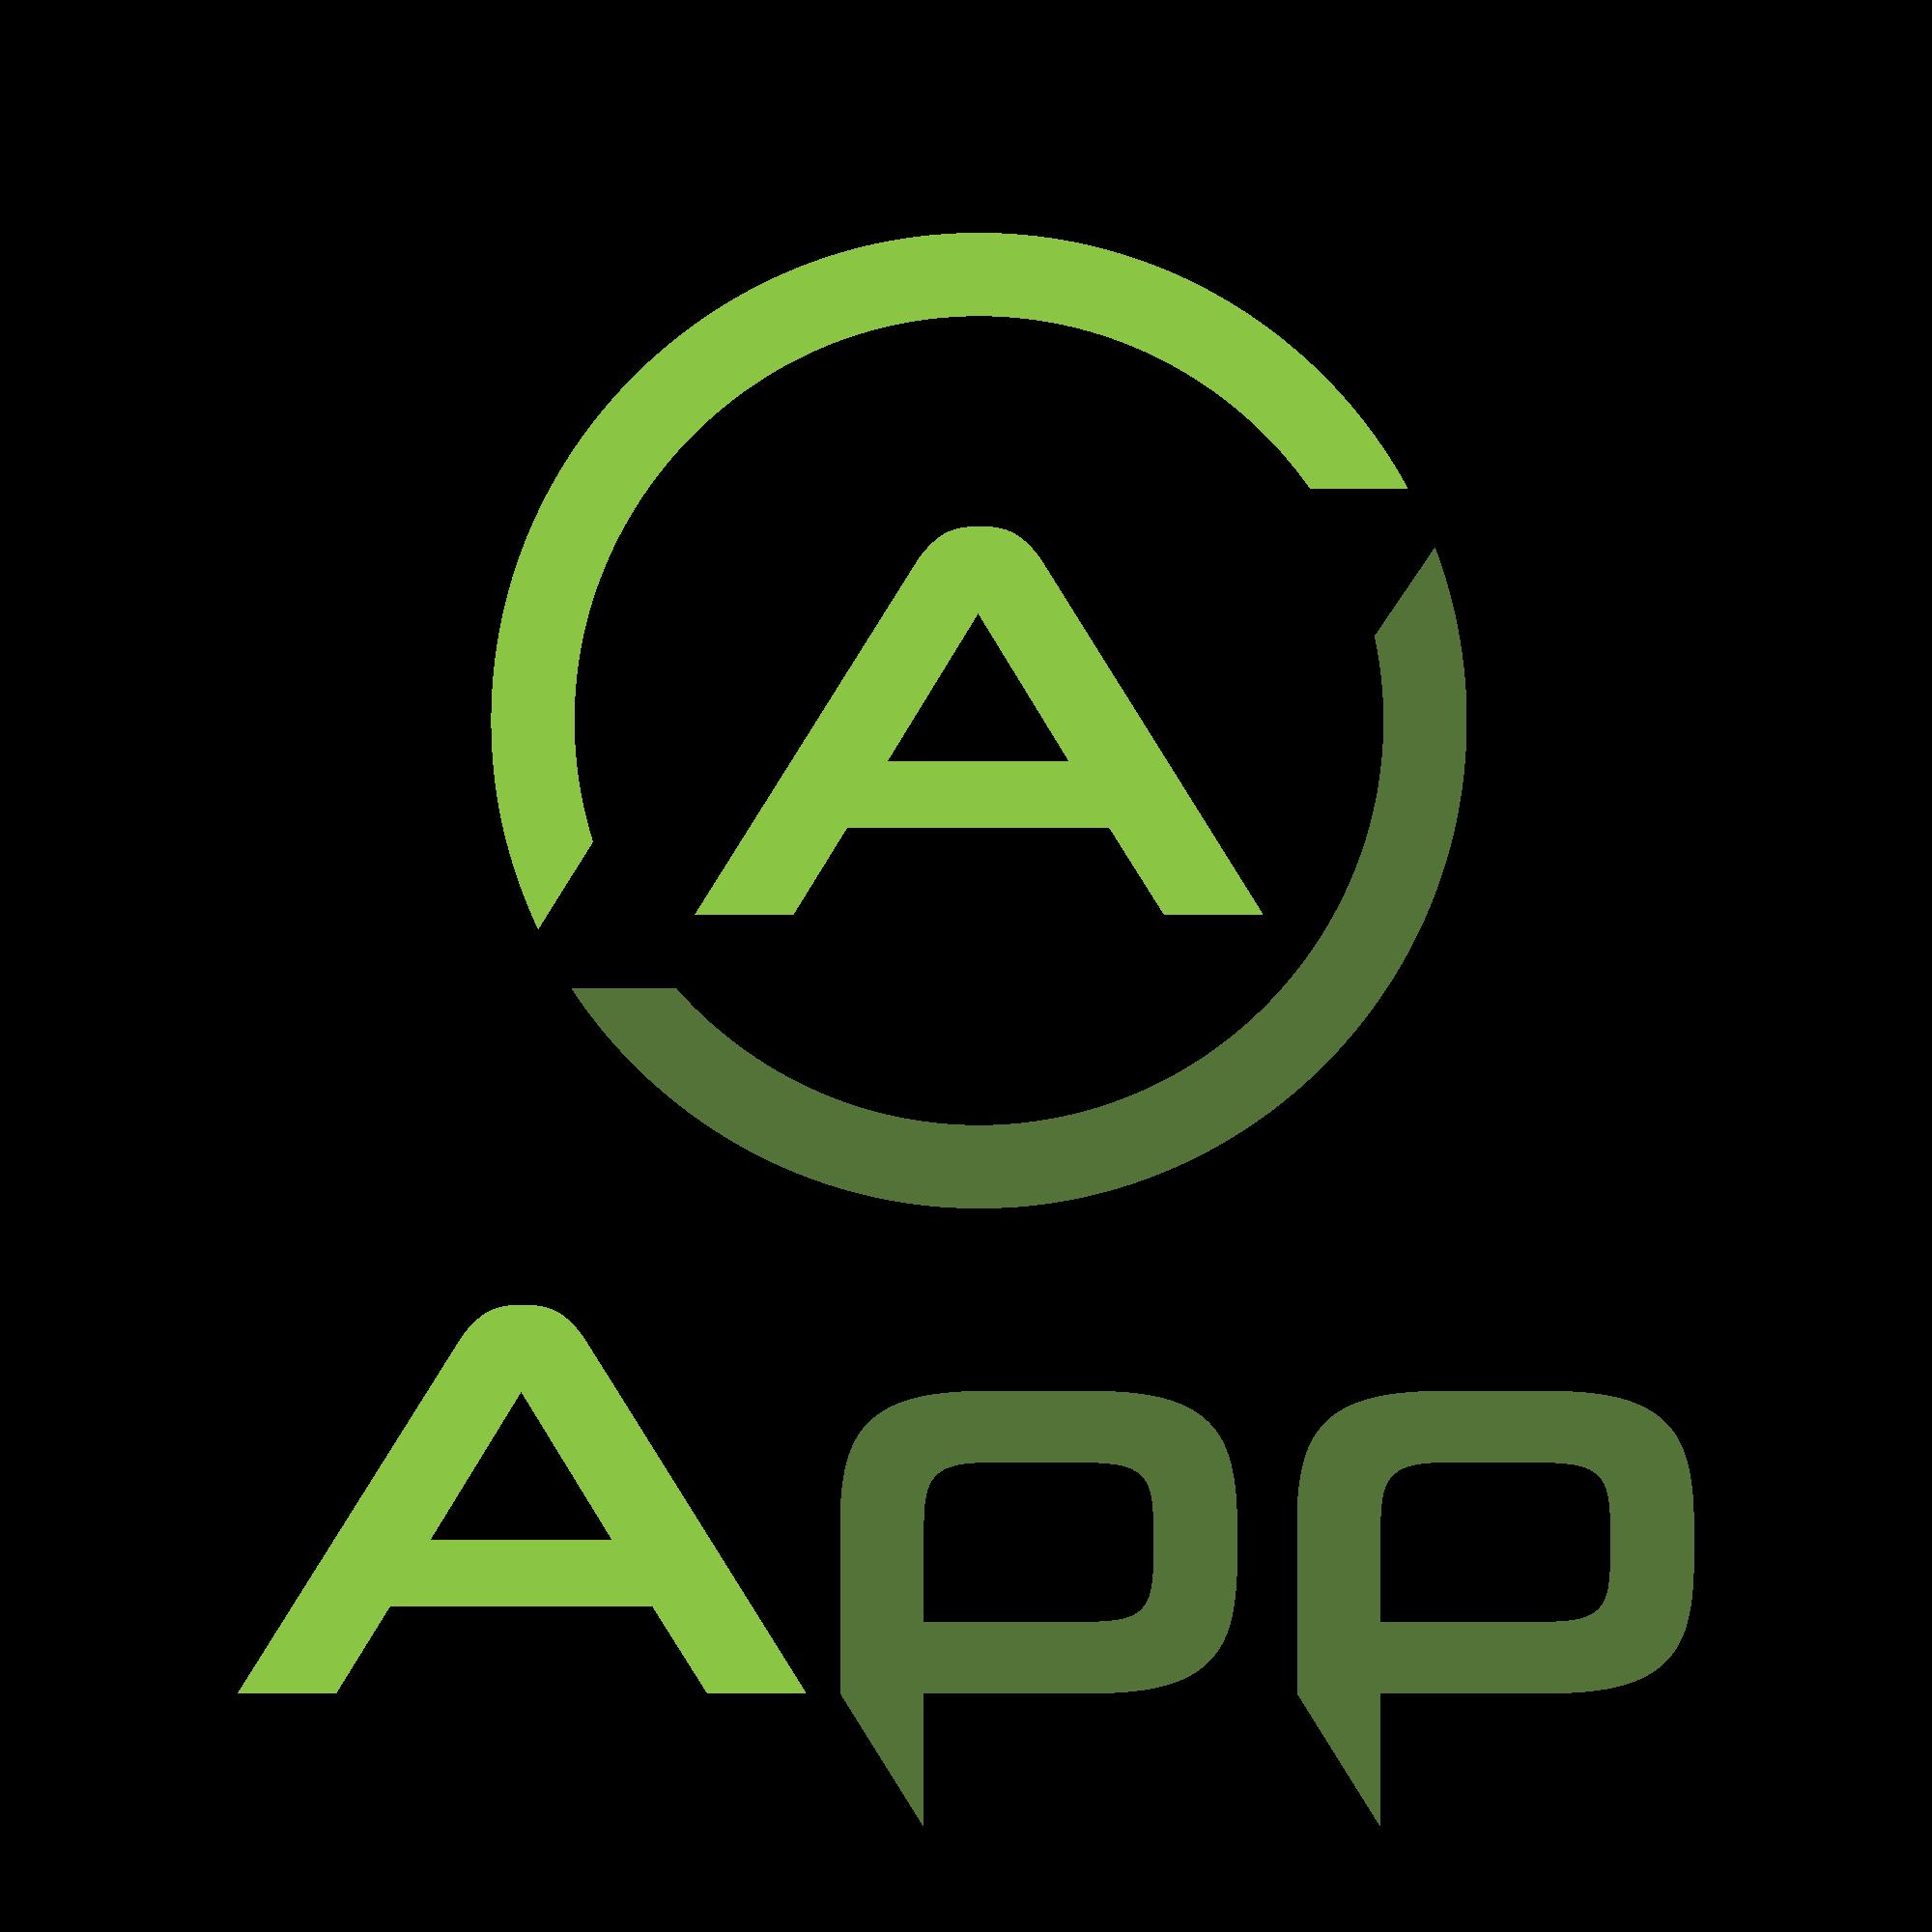 App-ico-v3.0-2000×2000-tsp